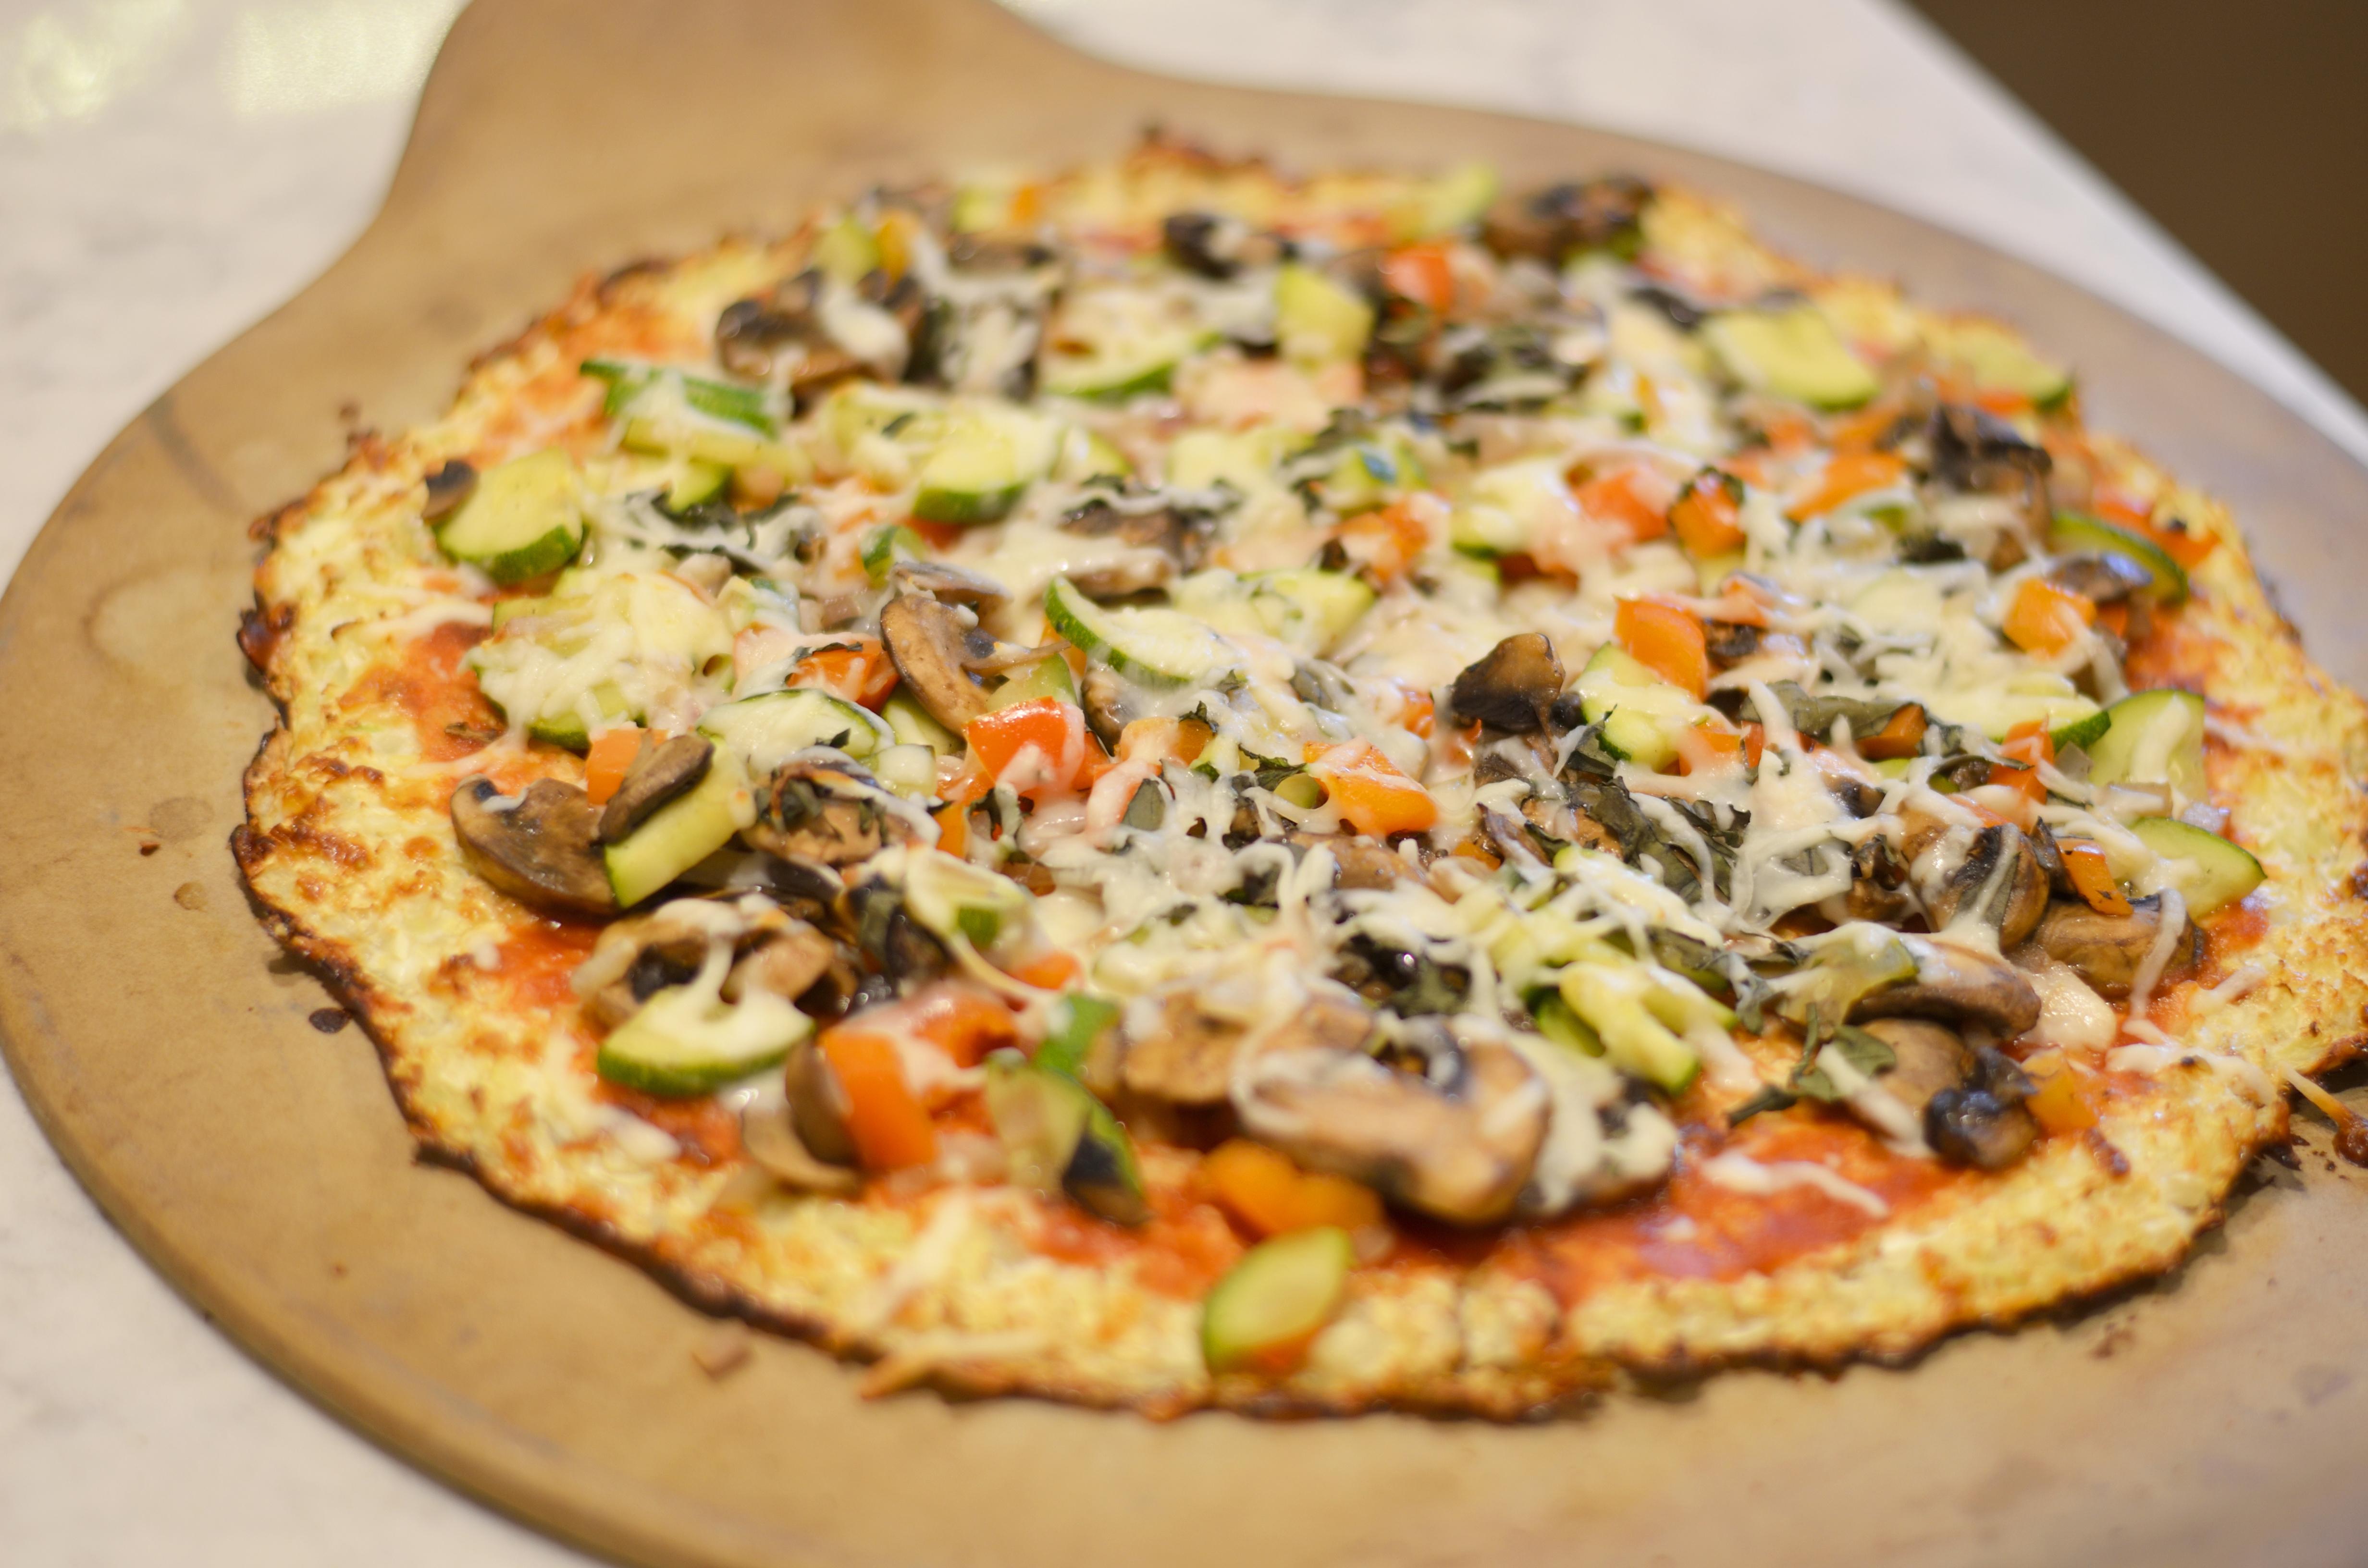 Celebrate National Pizza Day: Veggie Pizza with Cauliflower Crust